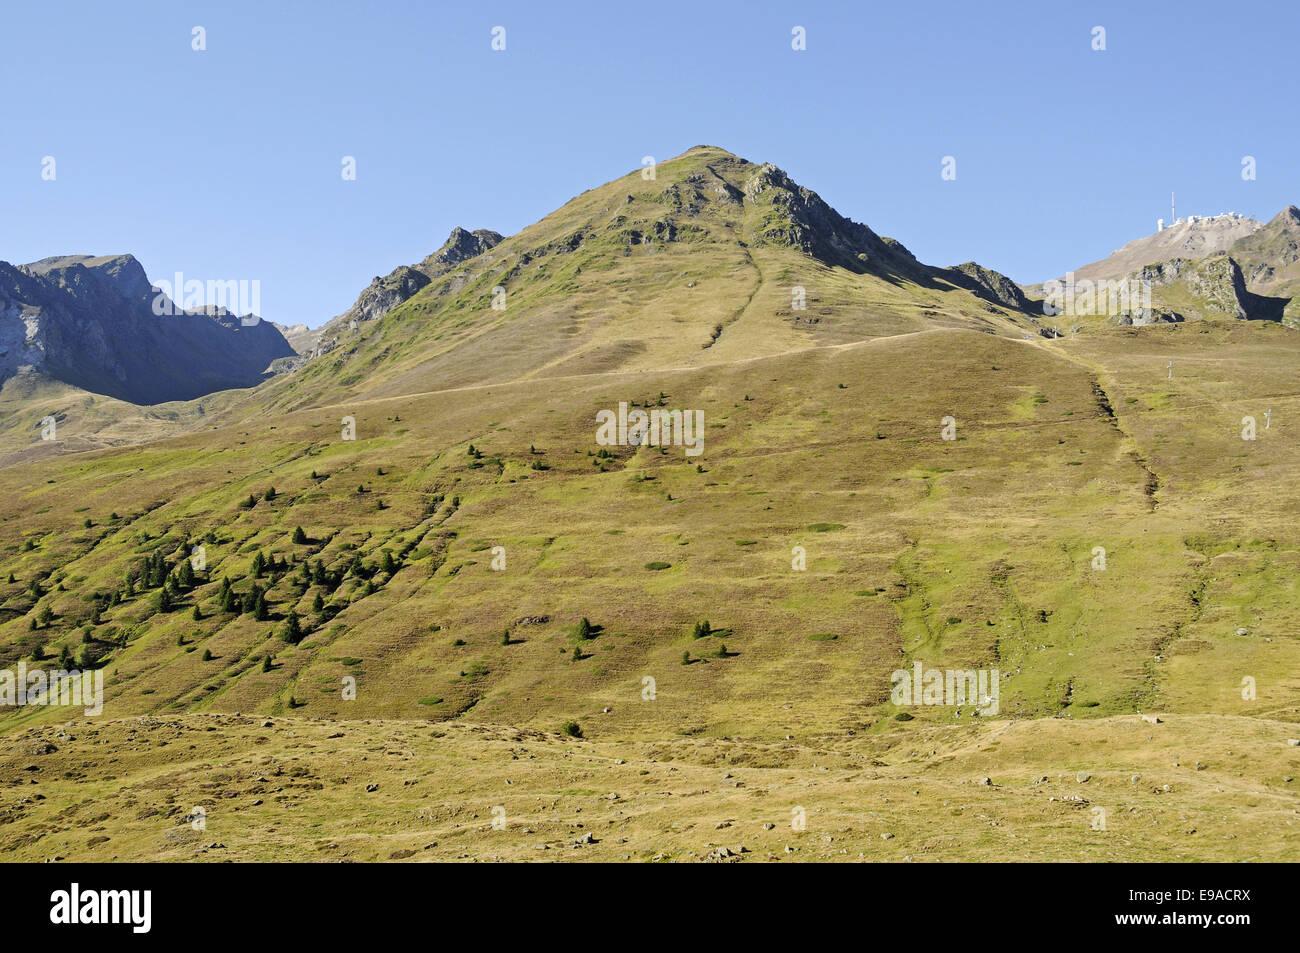 Col du Tourmalet, mountain, Bareges, France Stock Photo